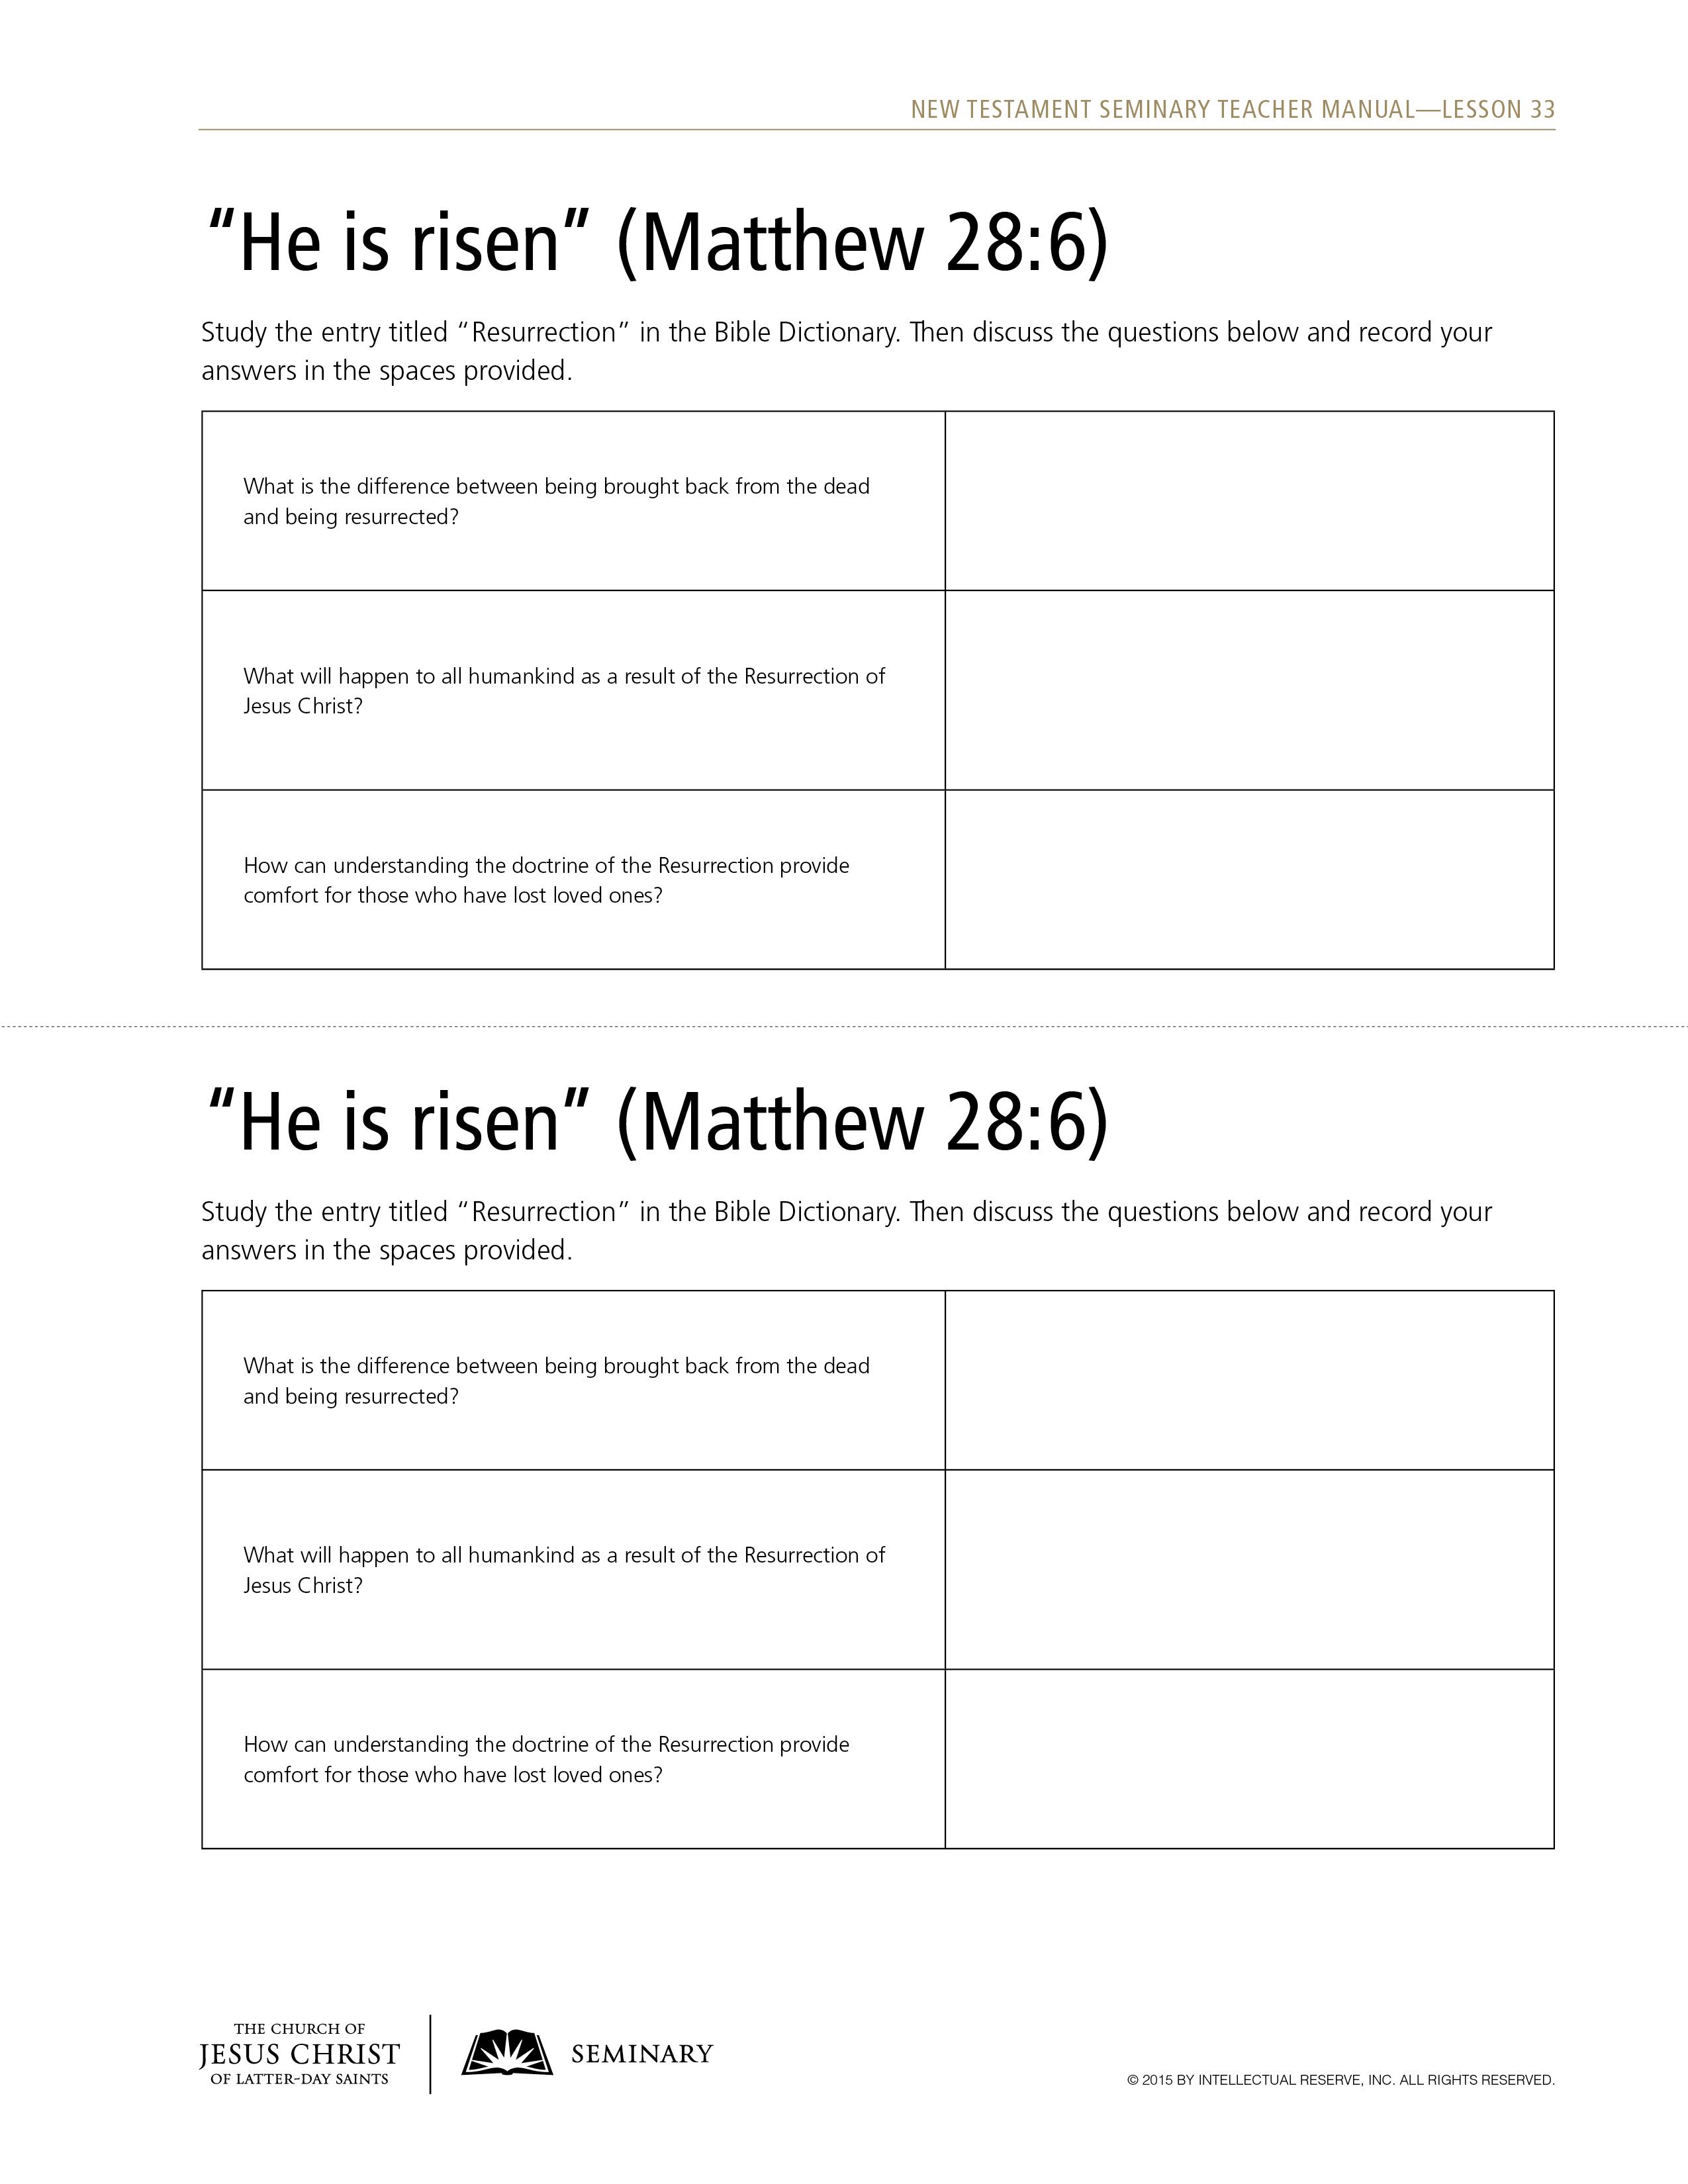 Lesson 33: Matthew 27:51–28:20